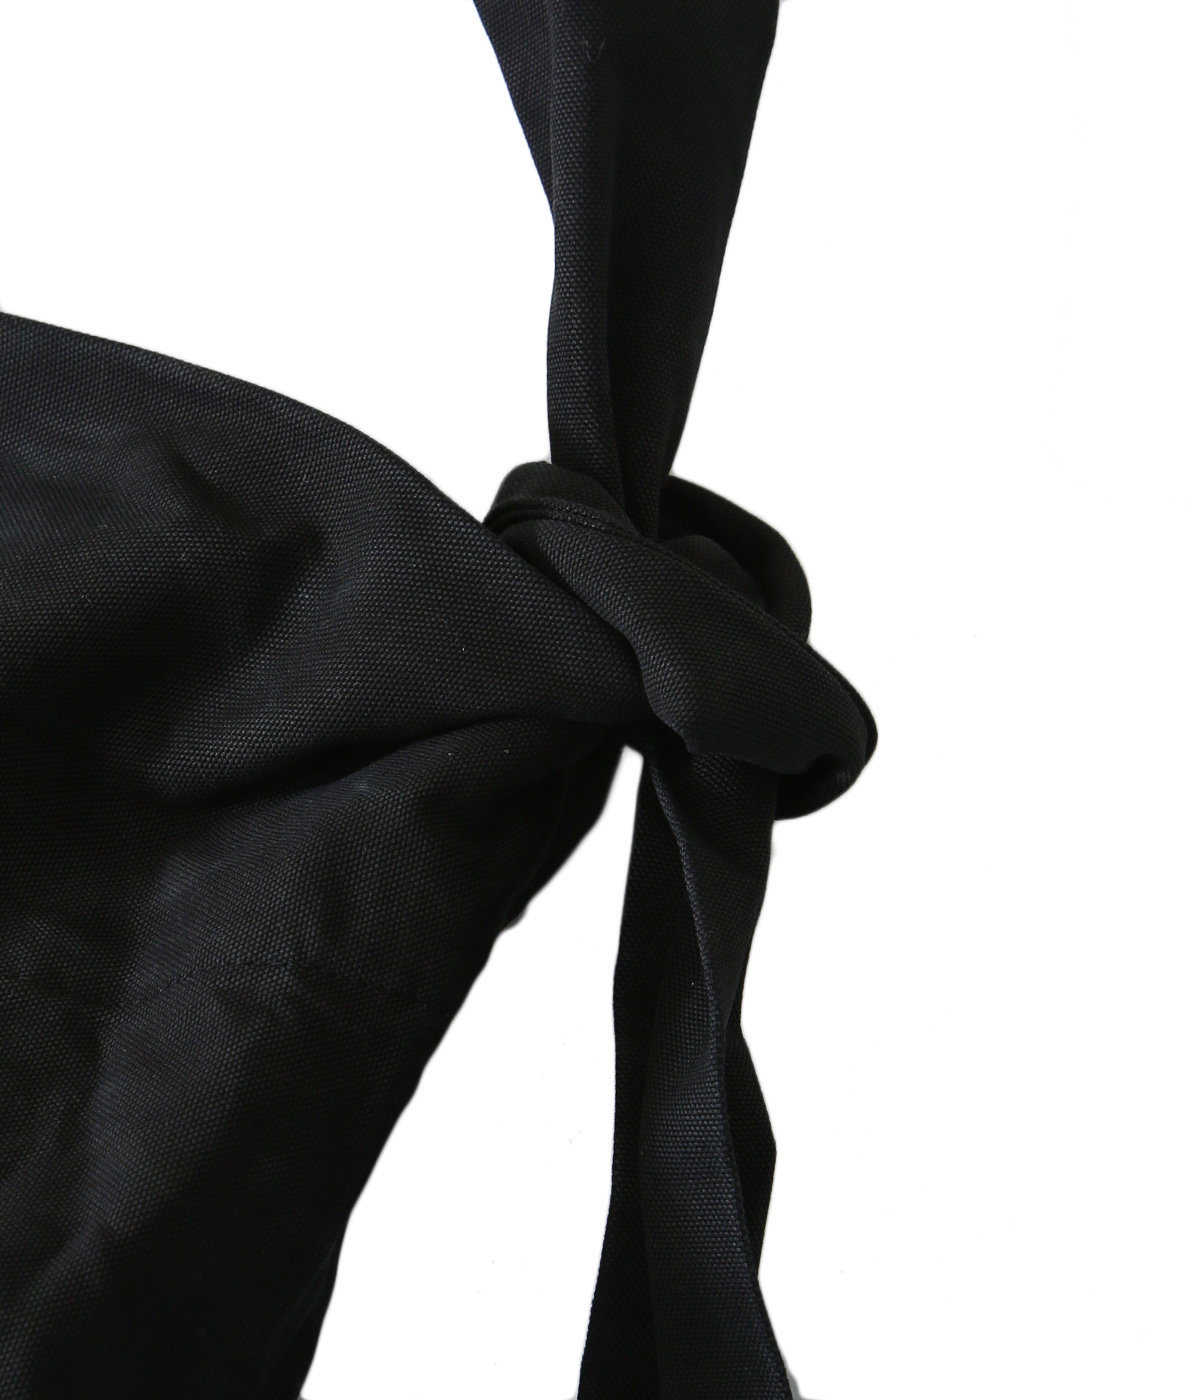 Large tied bag